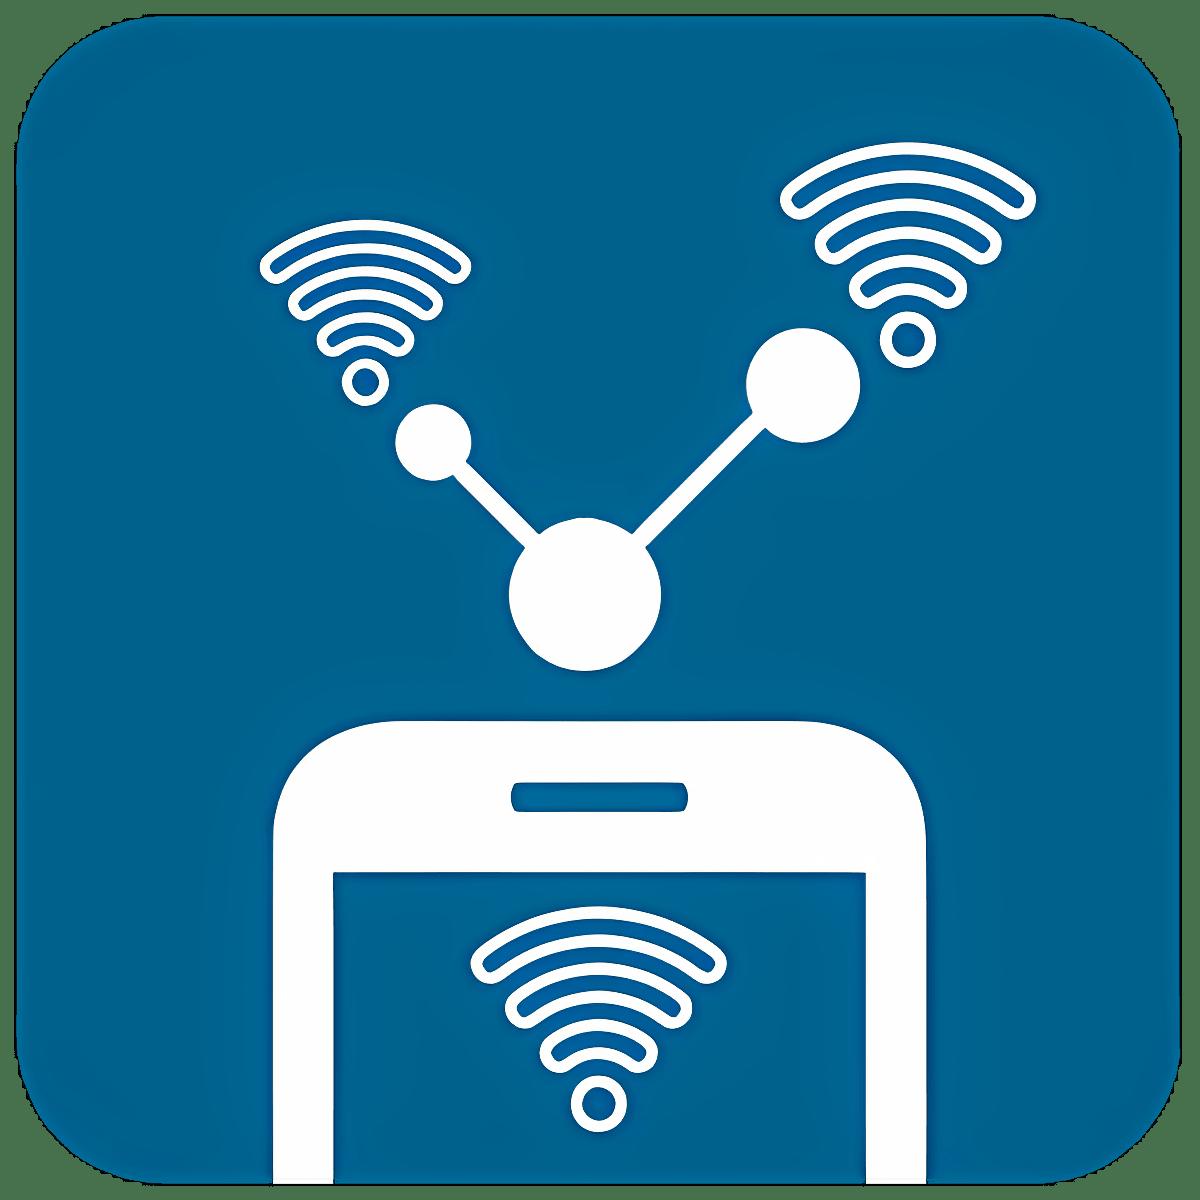 Portable Wifi Hotspot Share 1.0